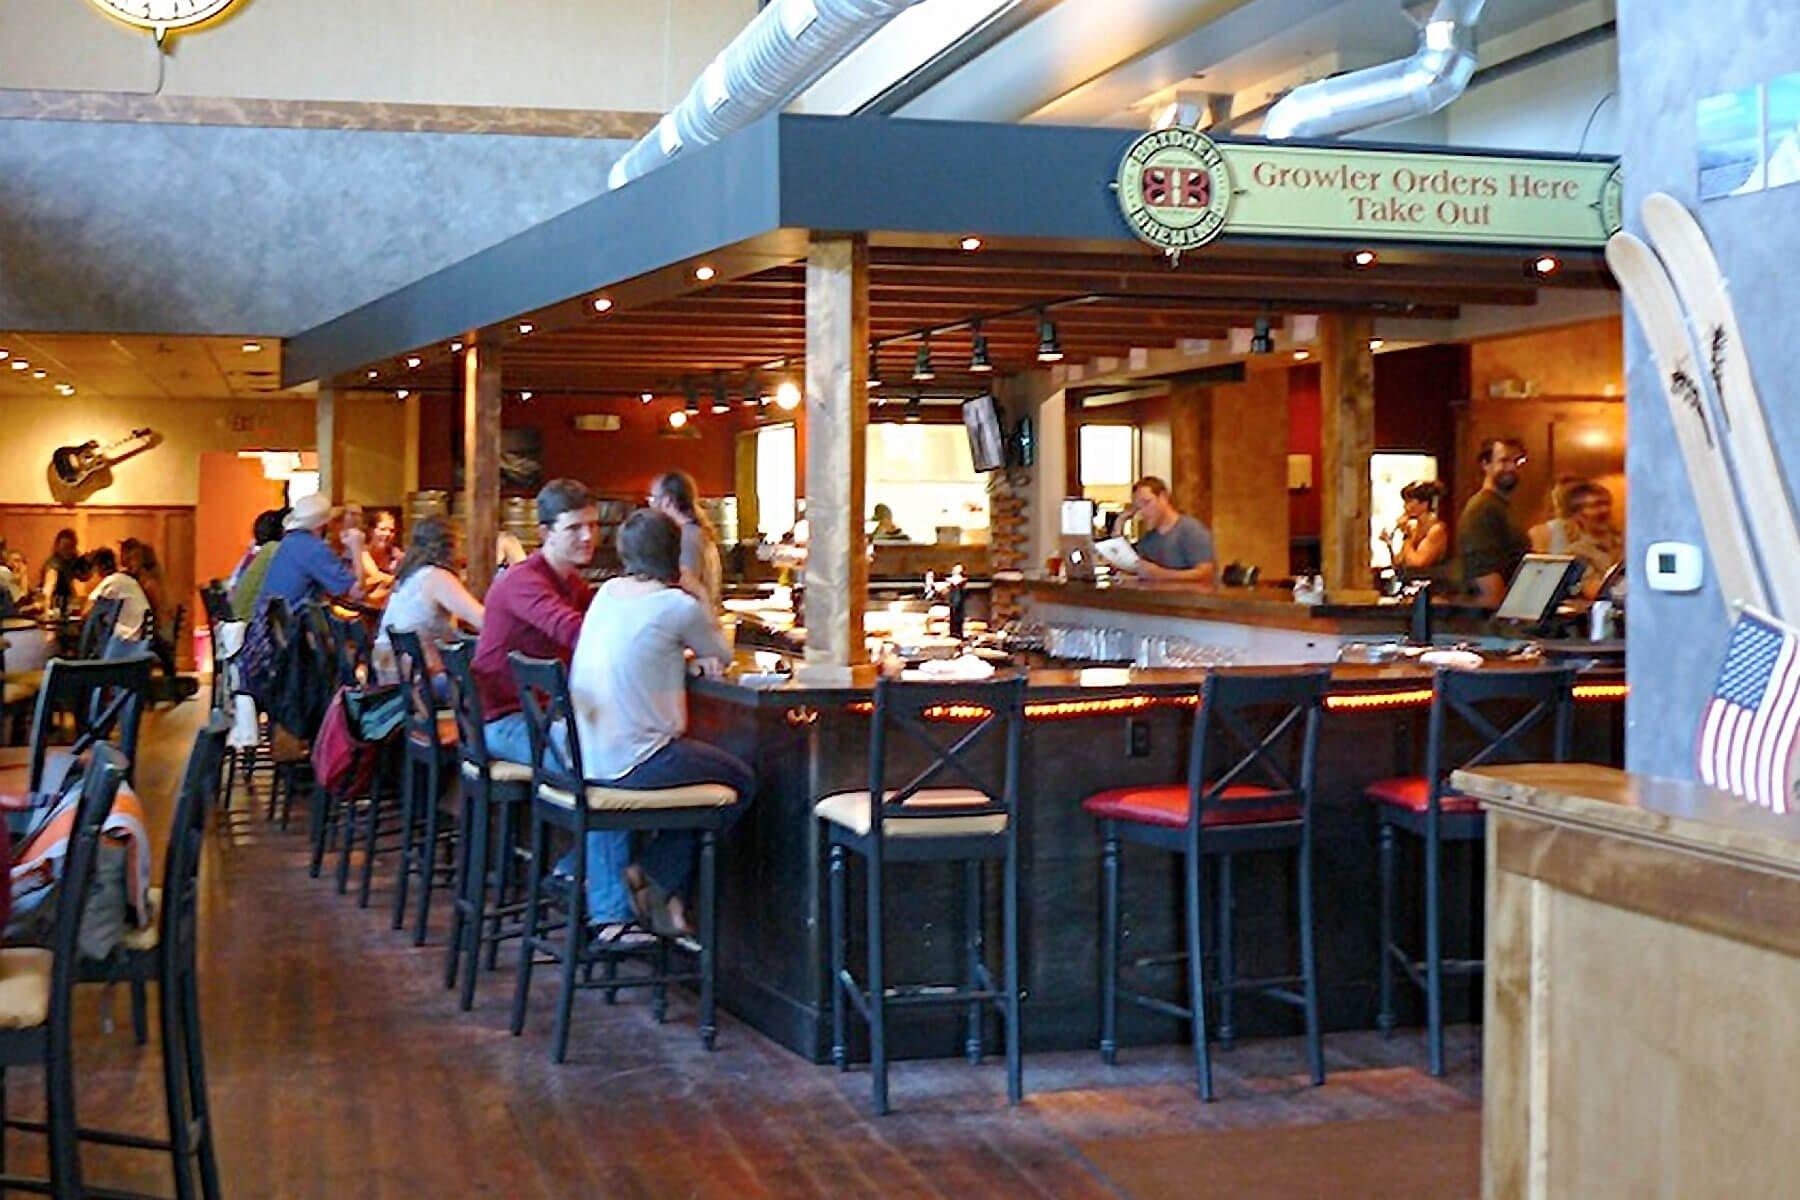 Inside the brewpub at Bridger Brewing in Bozeman, Montana